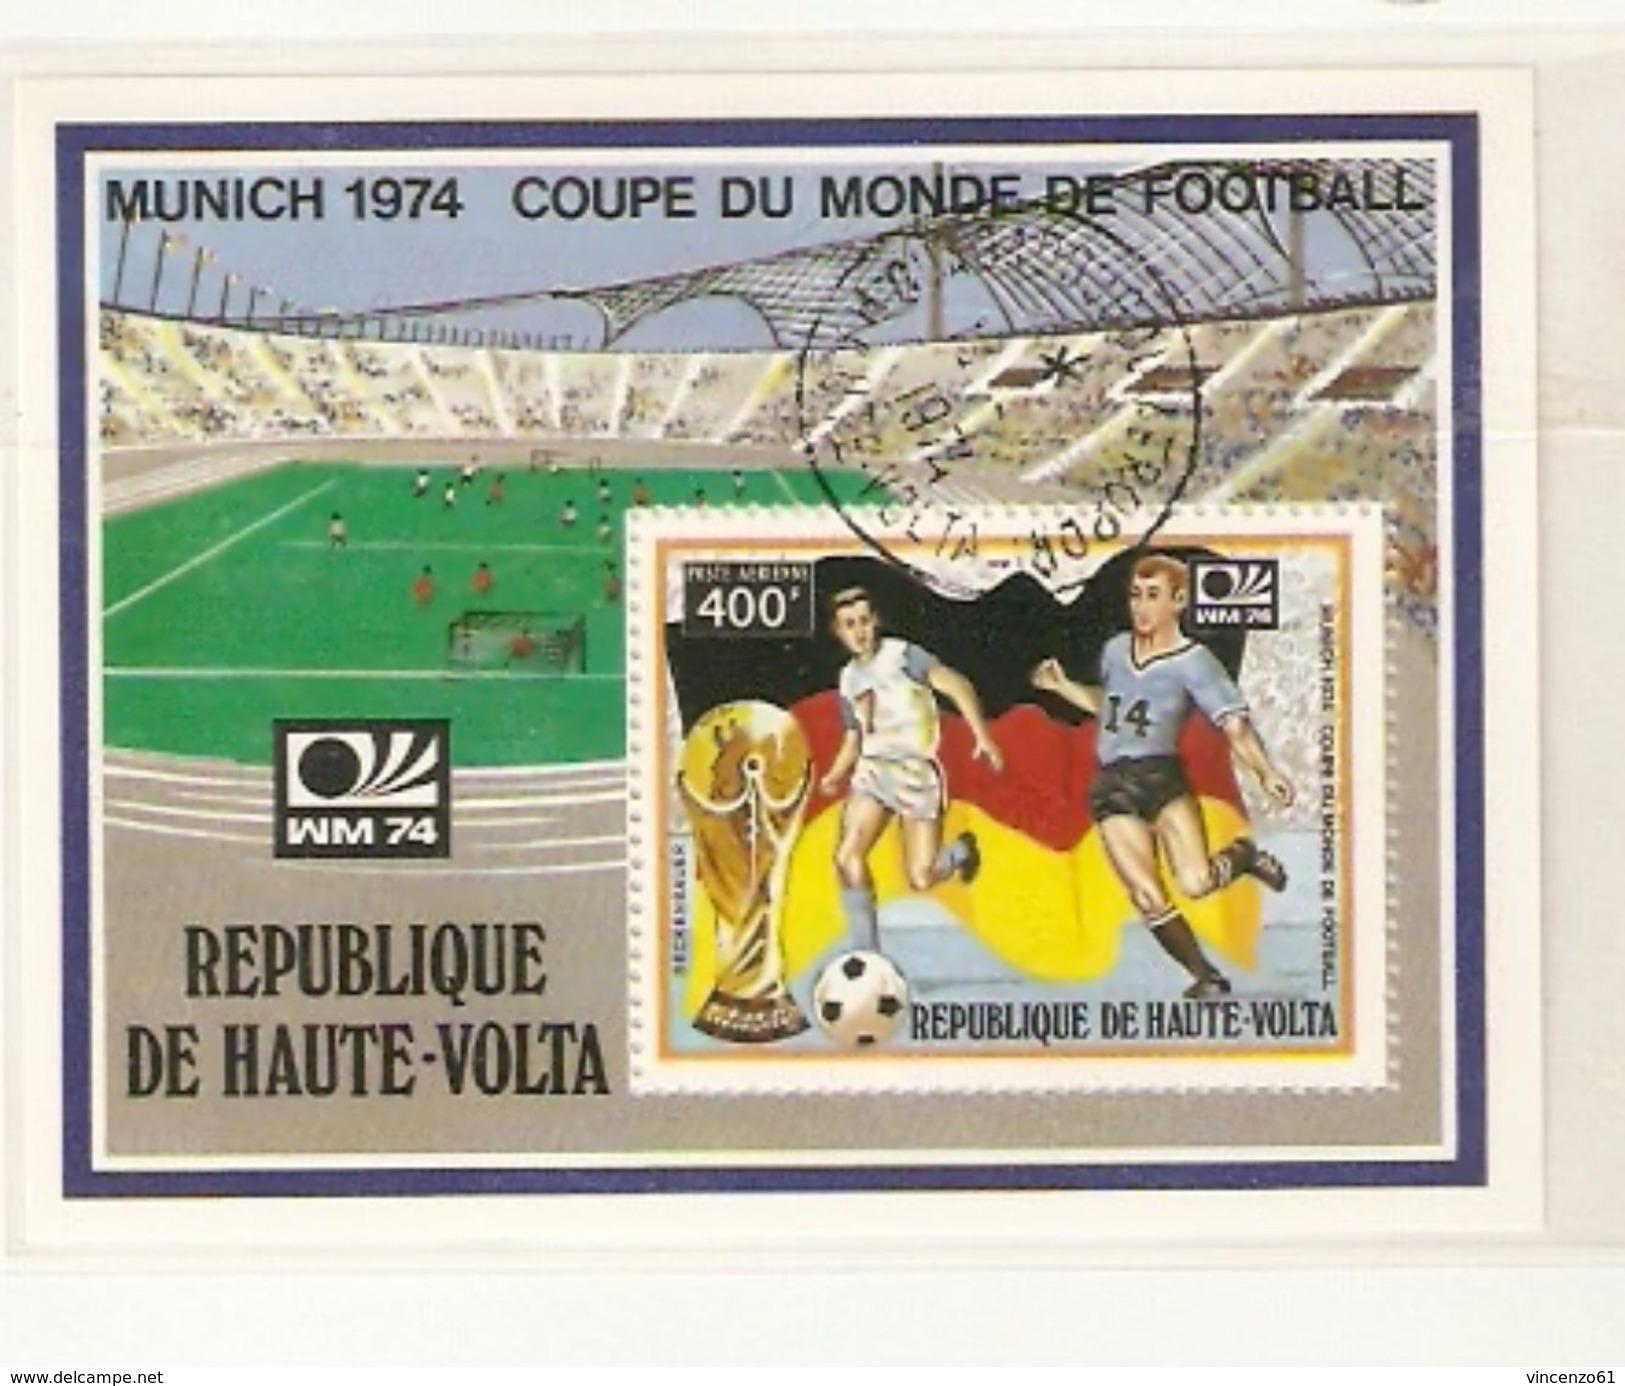 BURKINA FASO REPUBLIQUE D´HAUTE VOLTA FIFA WORLD CUP 1974 GERMANY 1974 - 1974 – Germania Ovest